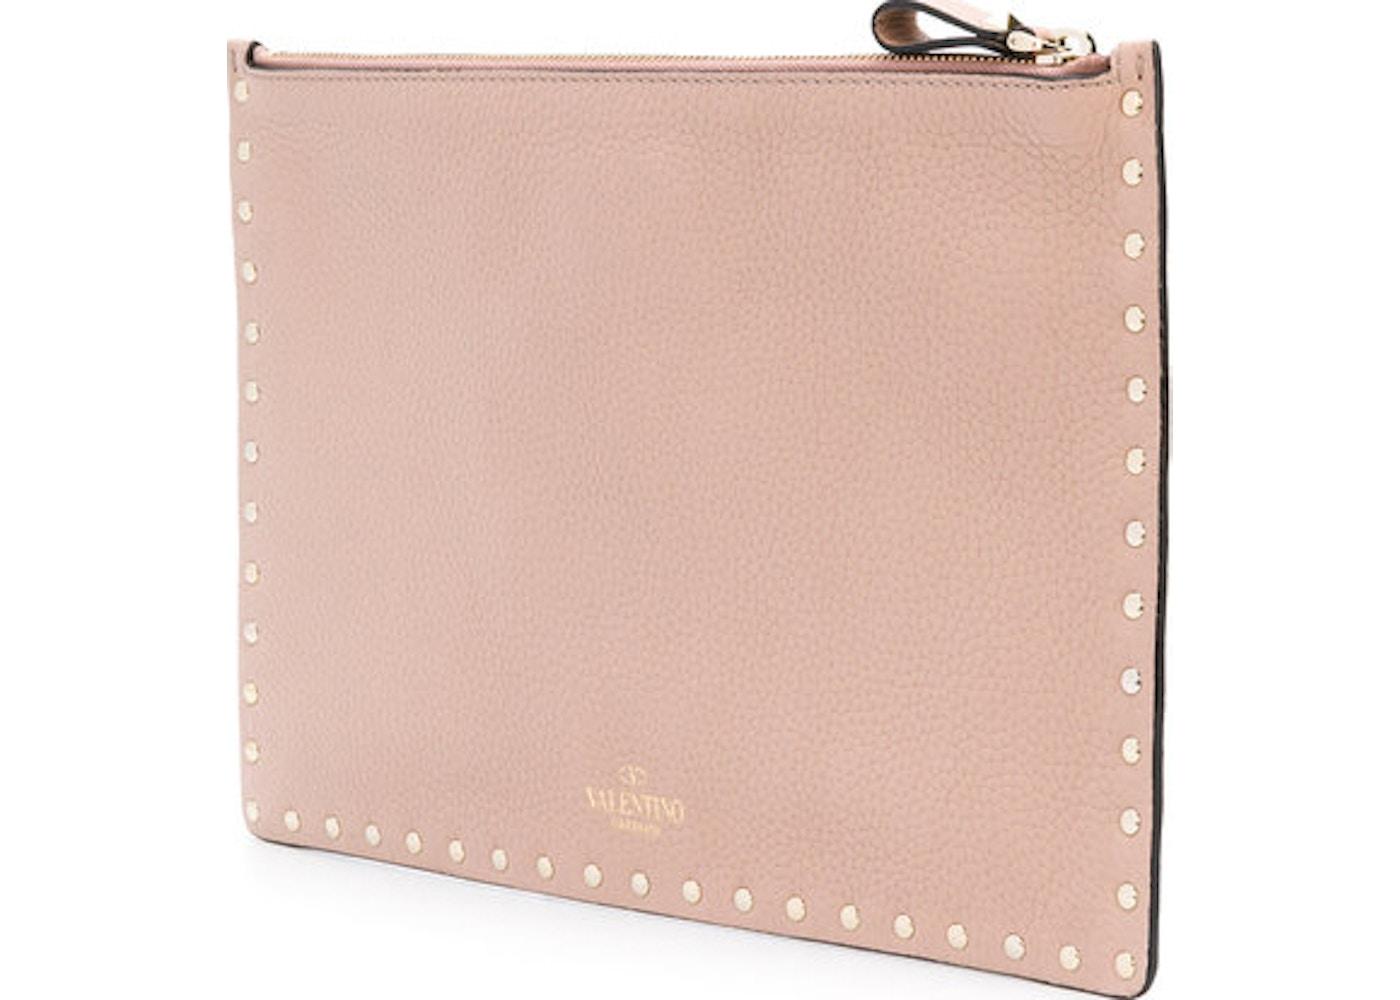 ccba2c8d12e2 Valentino Clutch Rockstud Smooth Pink